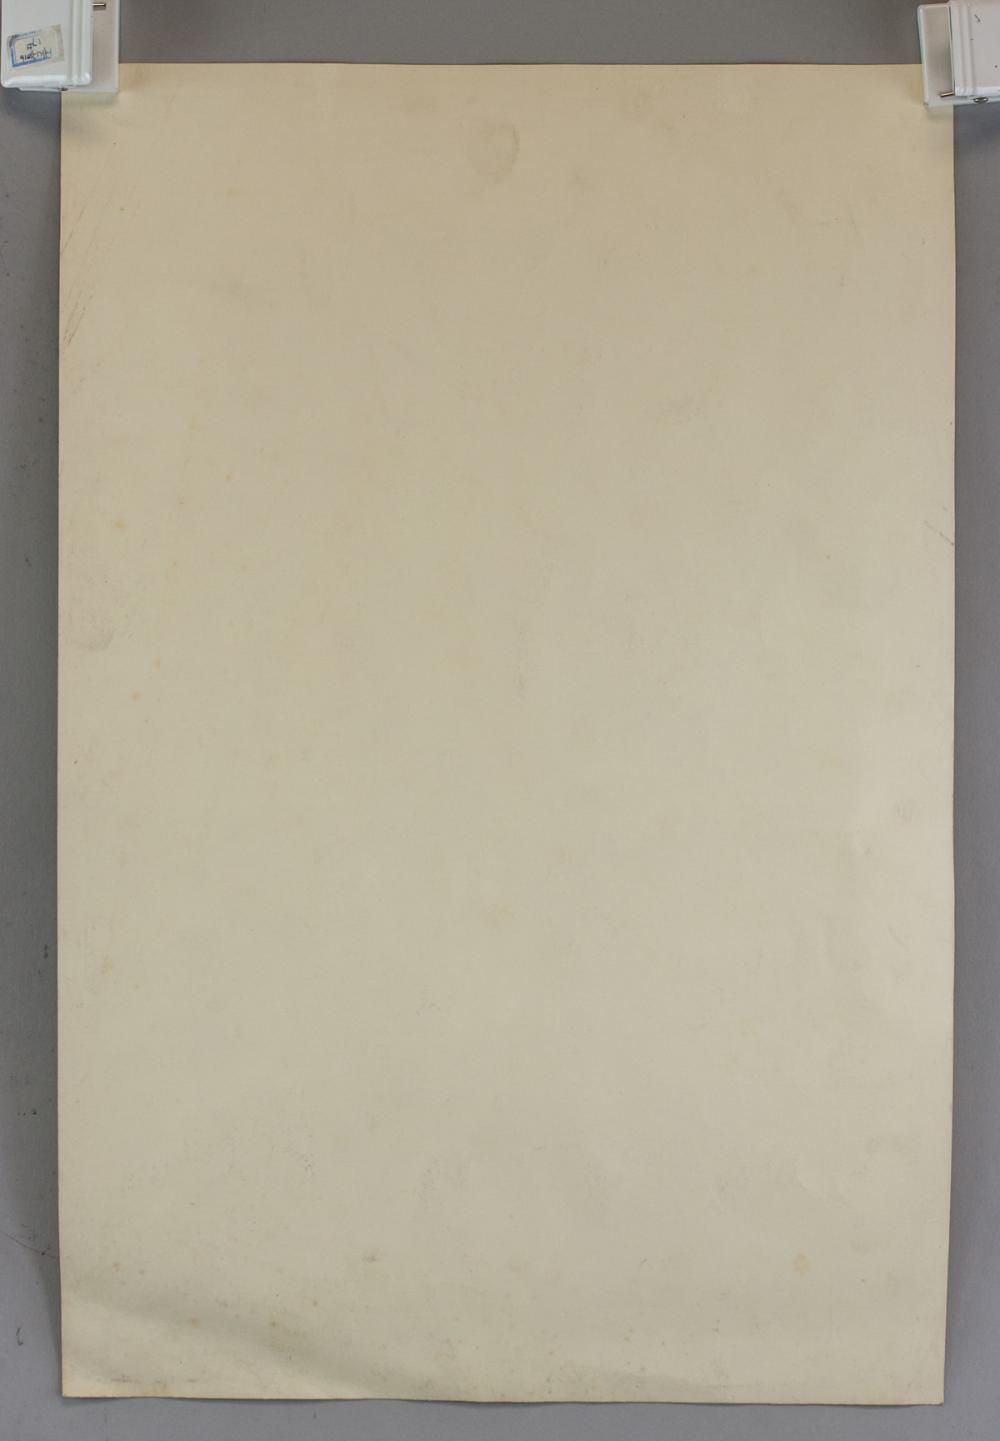 Lot 165: Jacques Villon Signed Litho Male/Female Figures